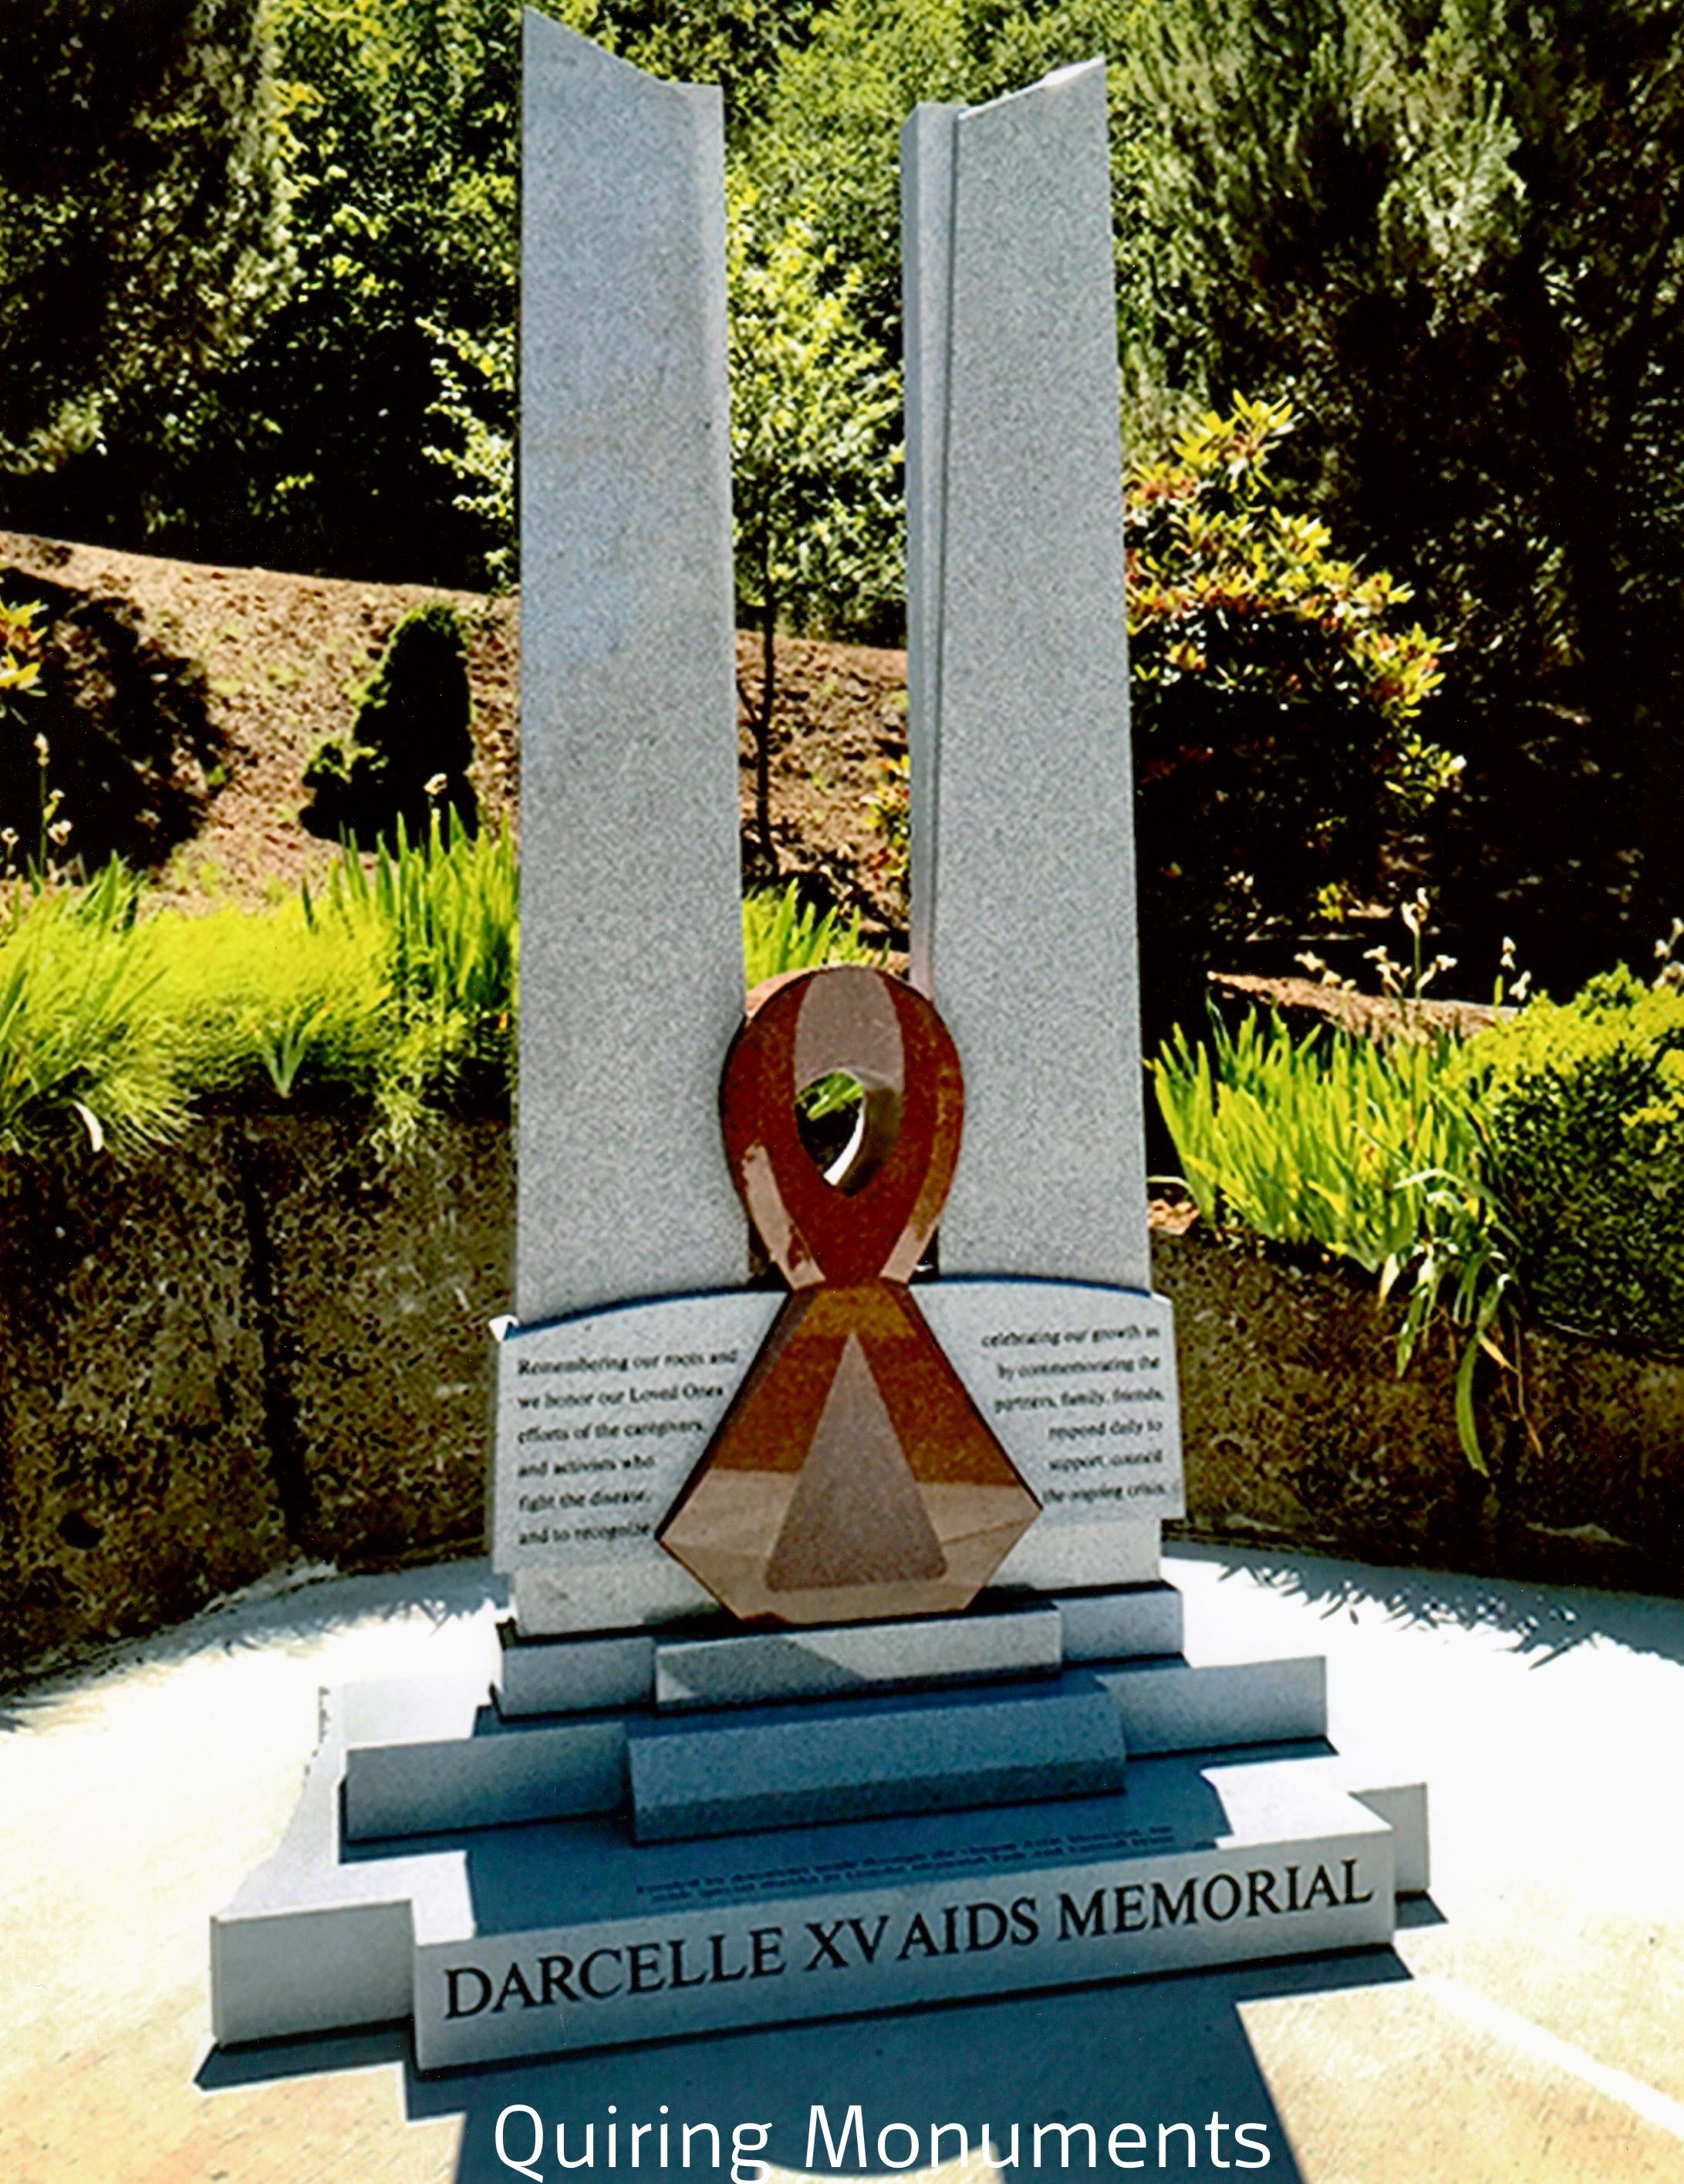 "1st Place Public Memorials ""Darcelle XV"", Quiring Monuments, Jon Reece, AICA"